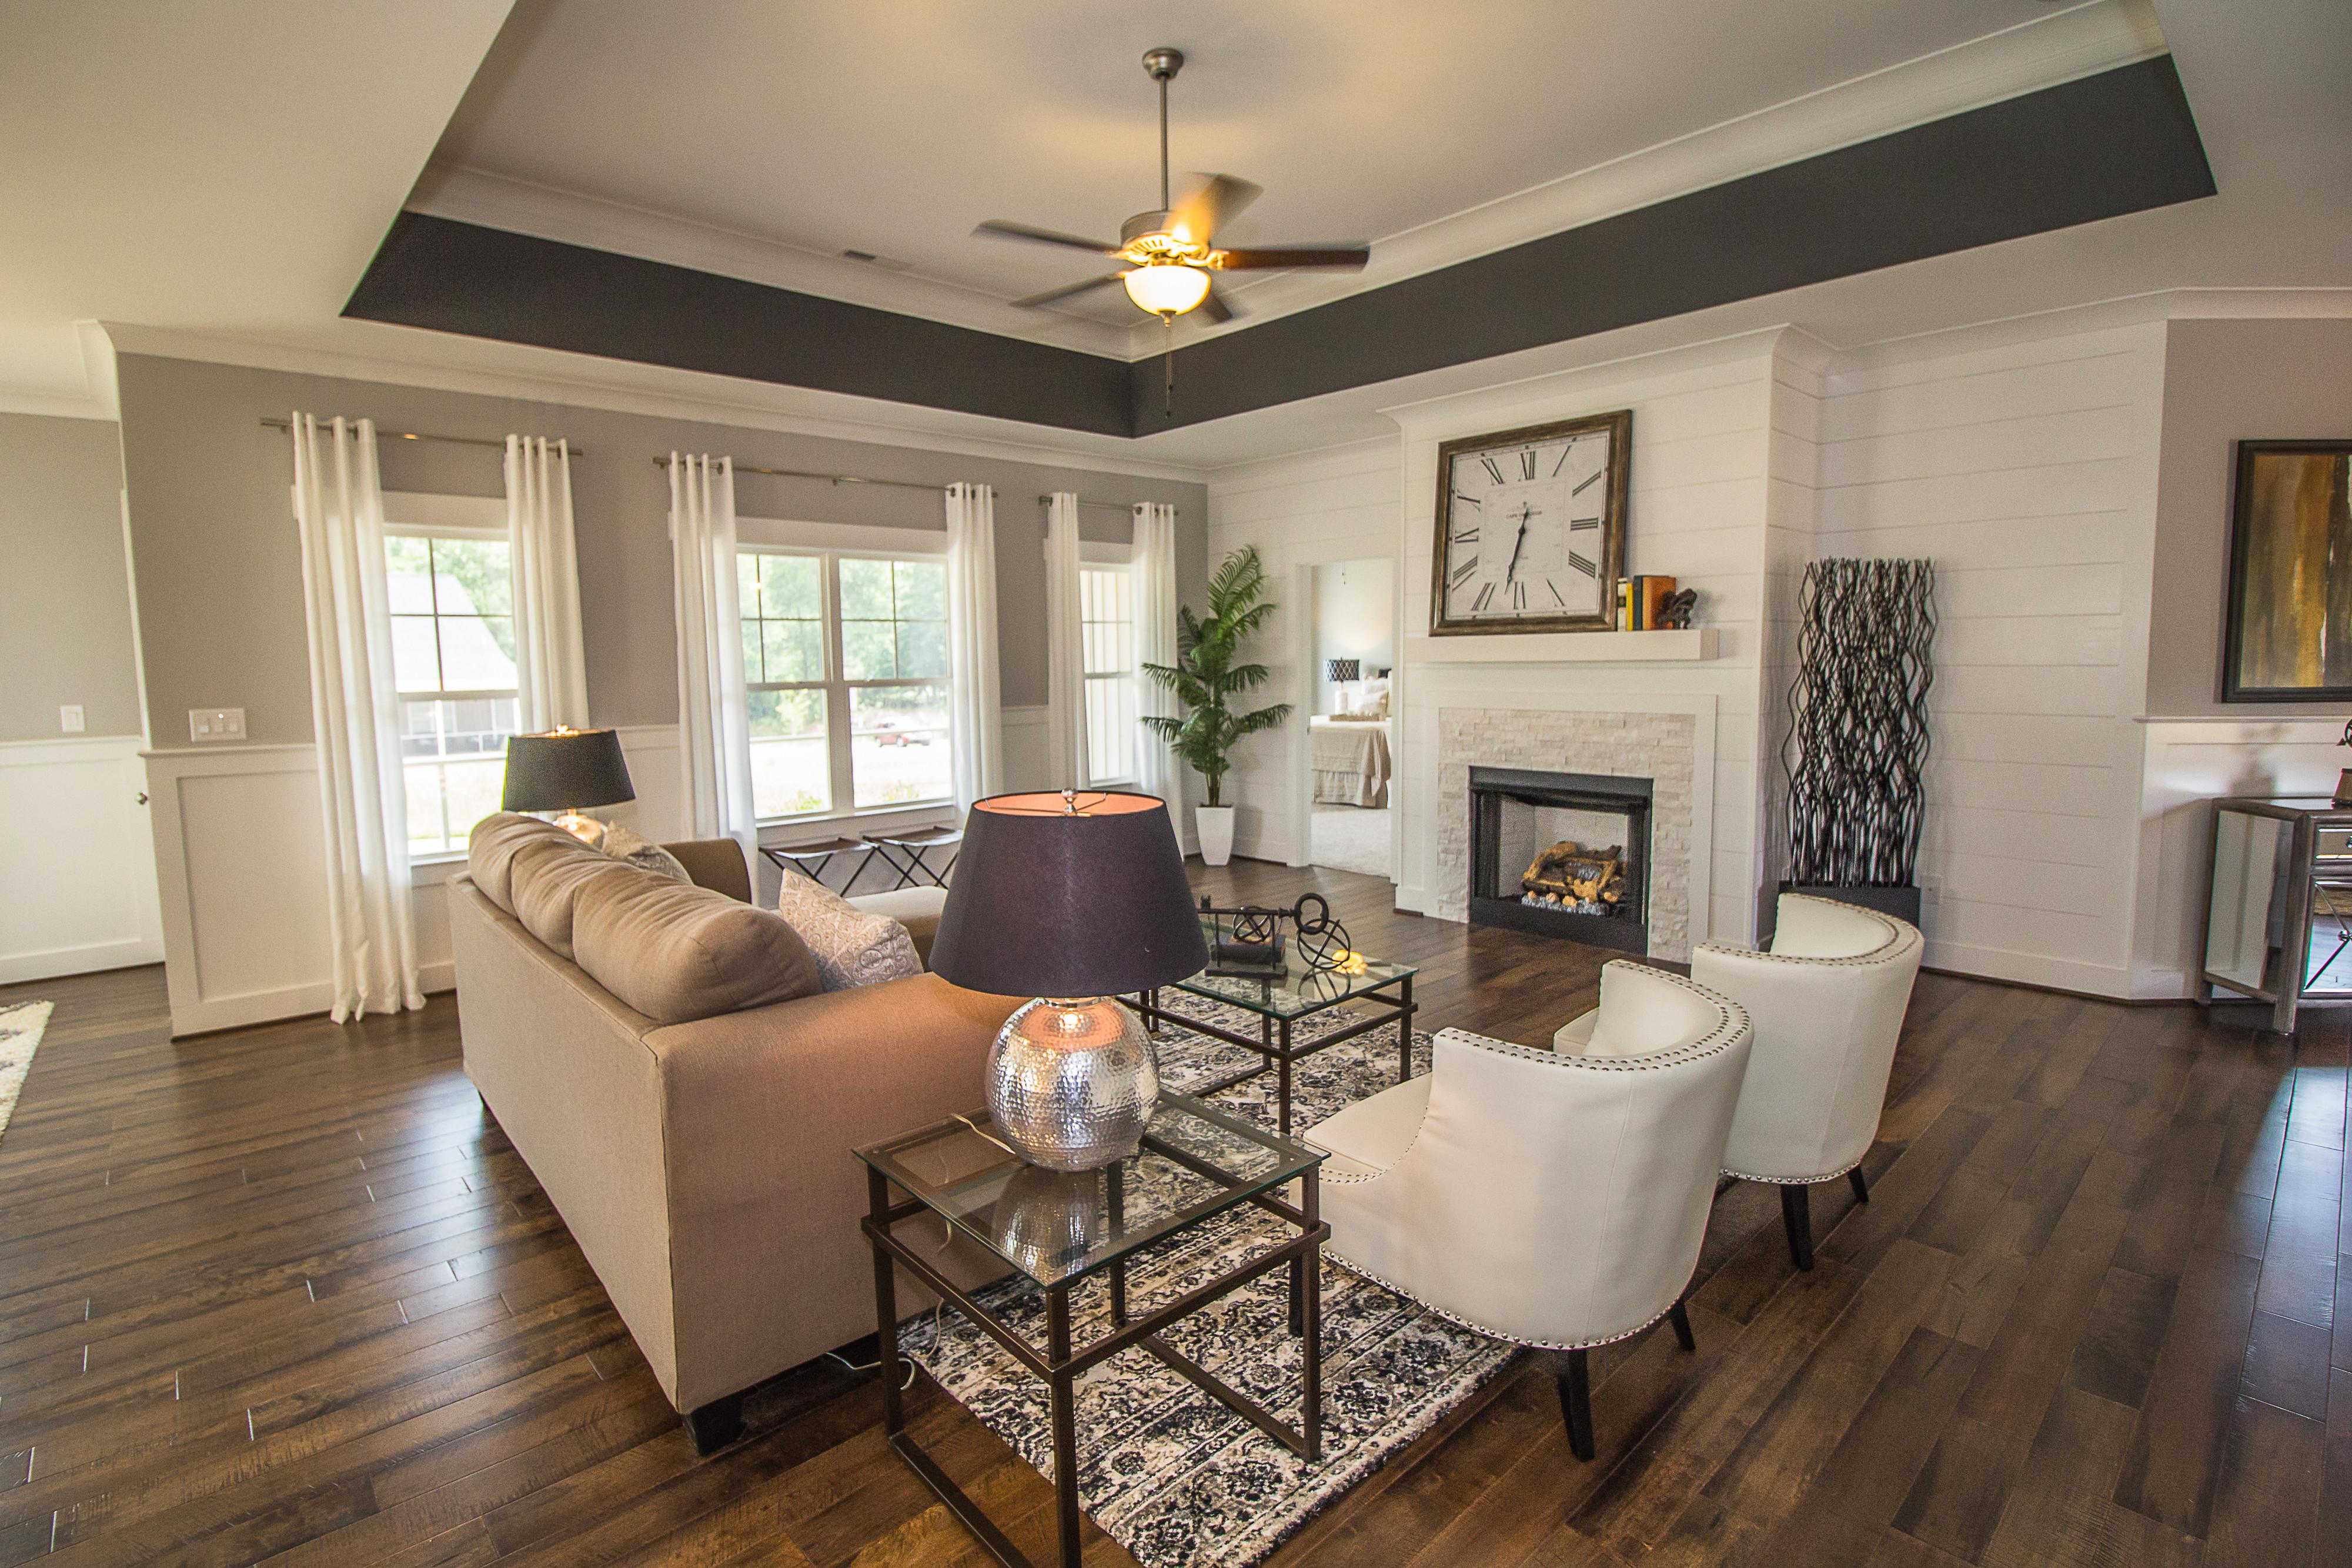 wholesale hardwood flooring charlotte nc of earla clark keller williams bellawood trinity nc throughout floorplans